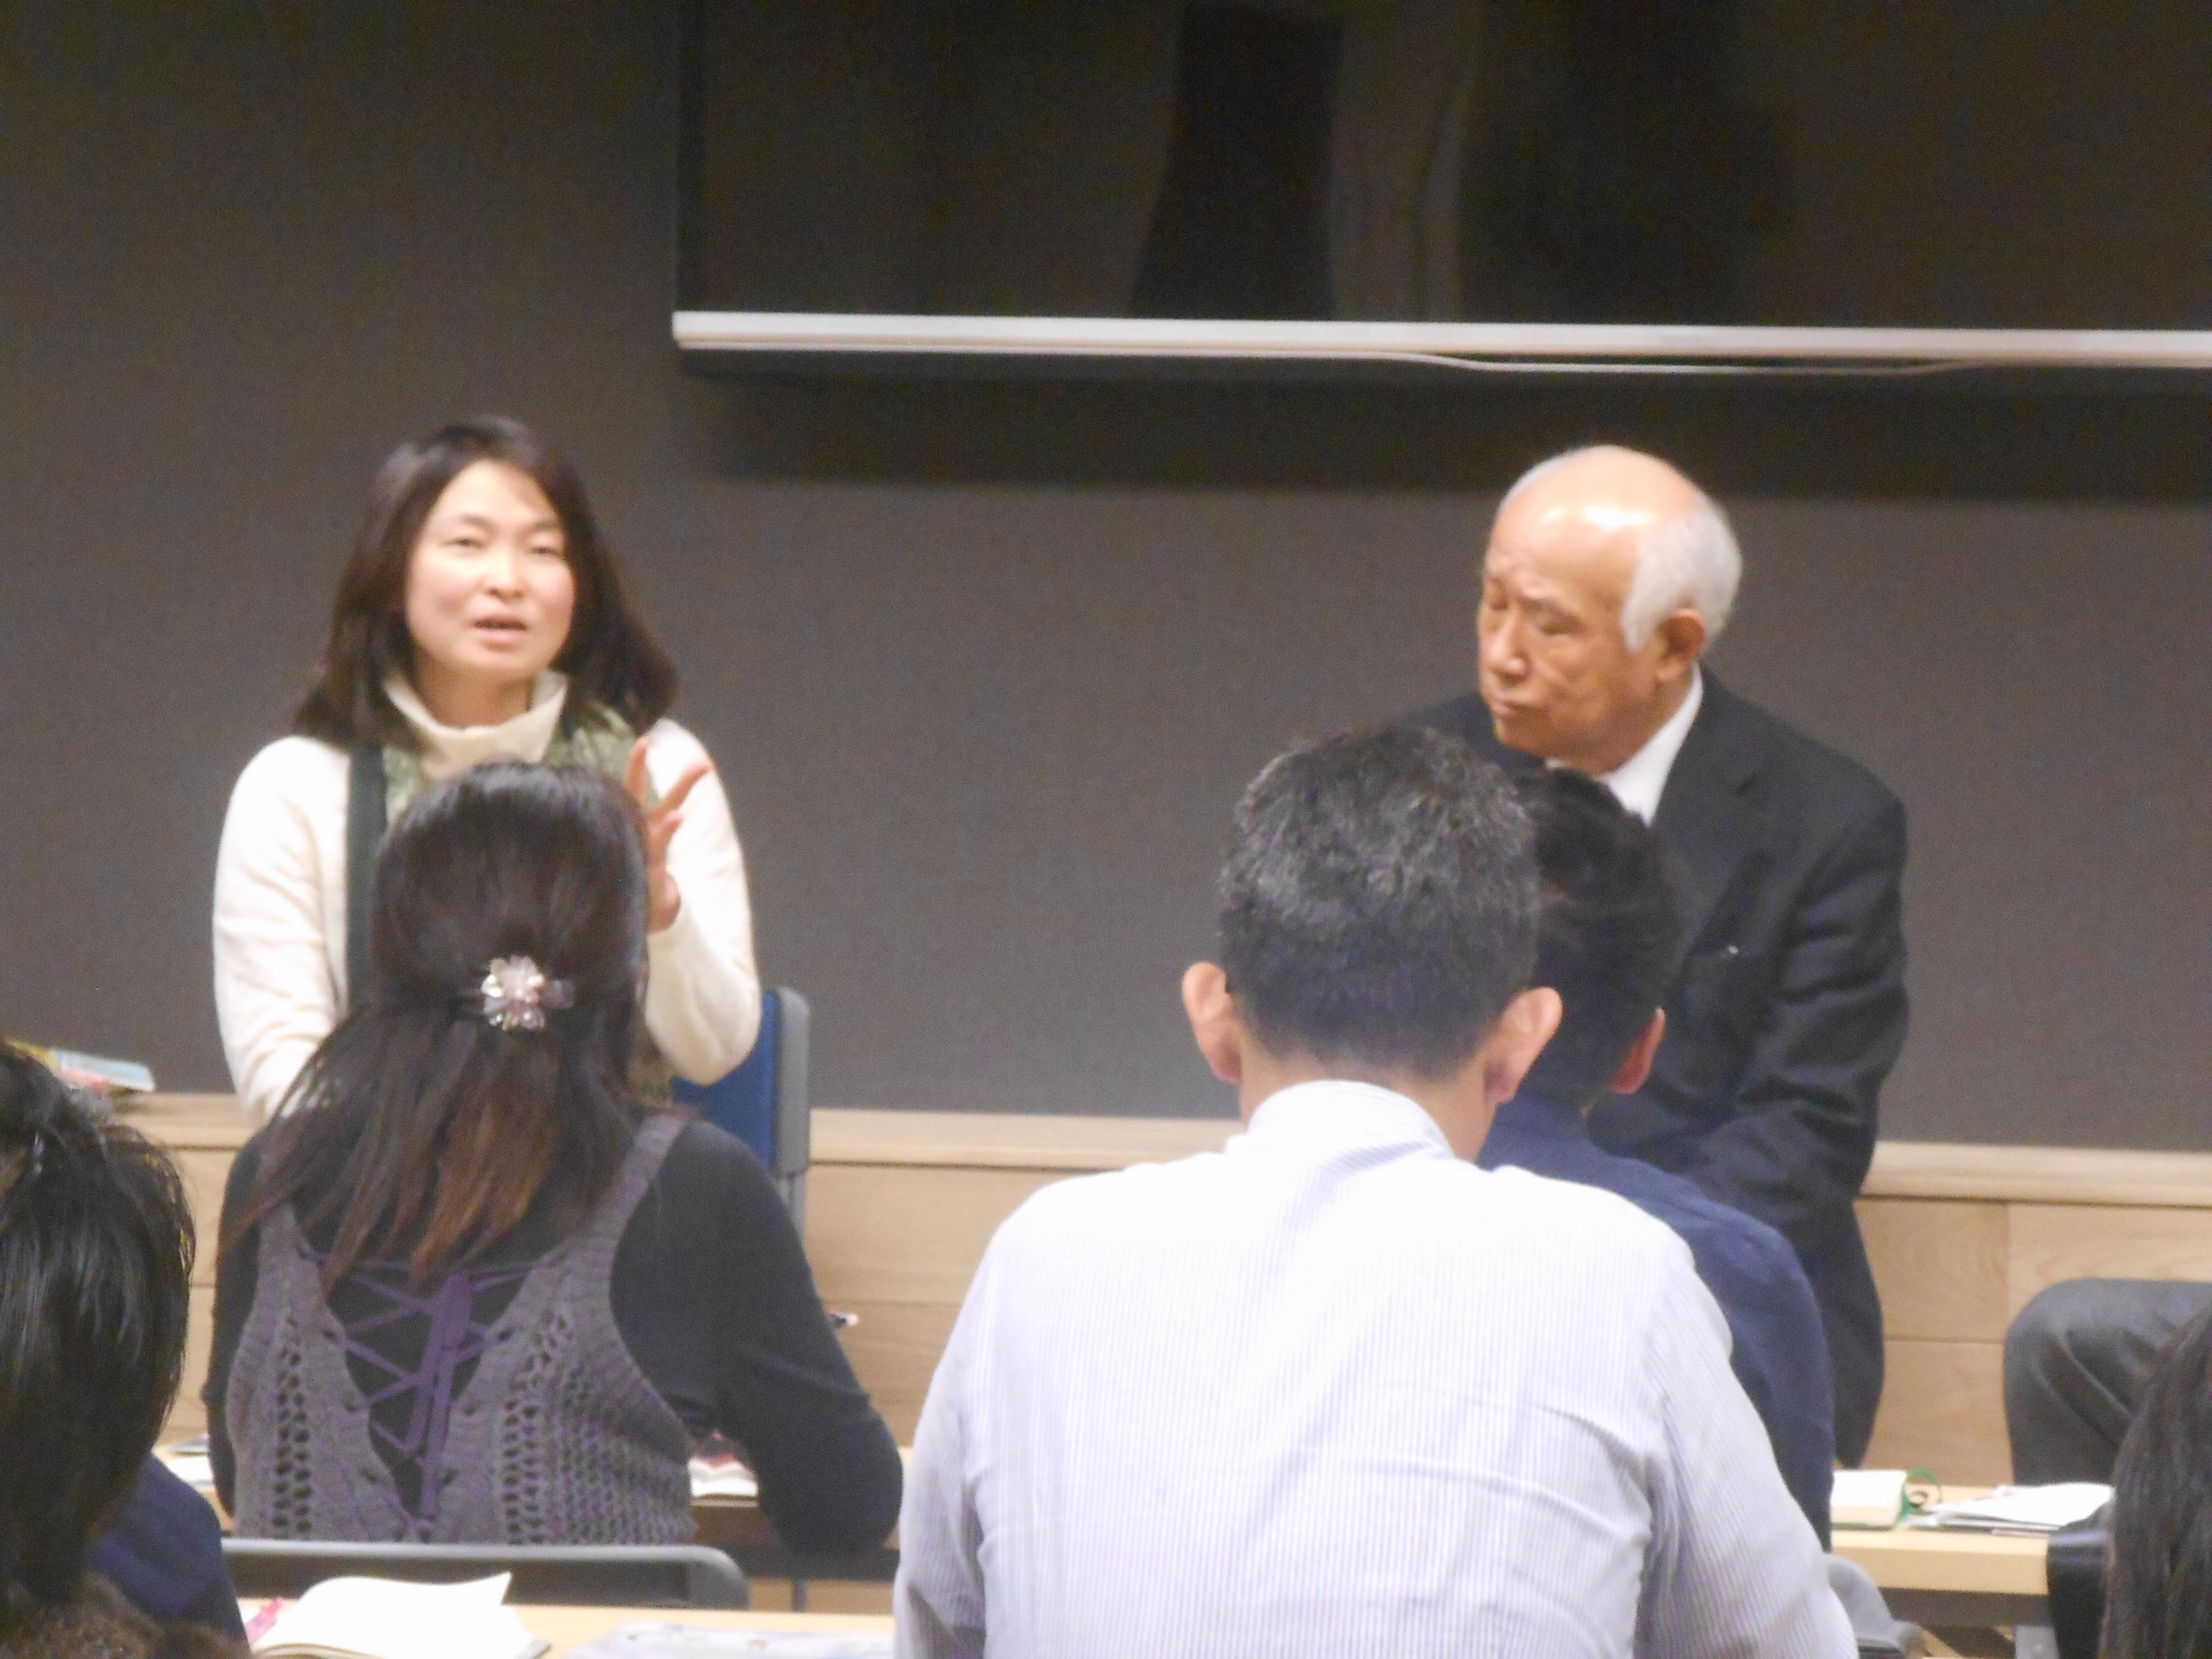 DSCN0482 - 平成30年度 東京思風塾 4月7日(土)「時代が問題をつくり、問題が人物をつくる」